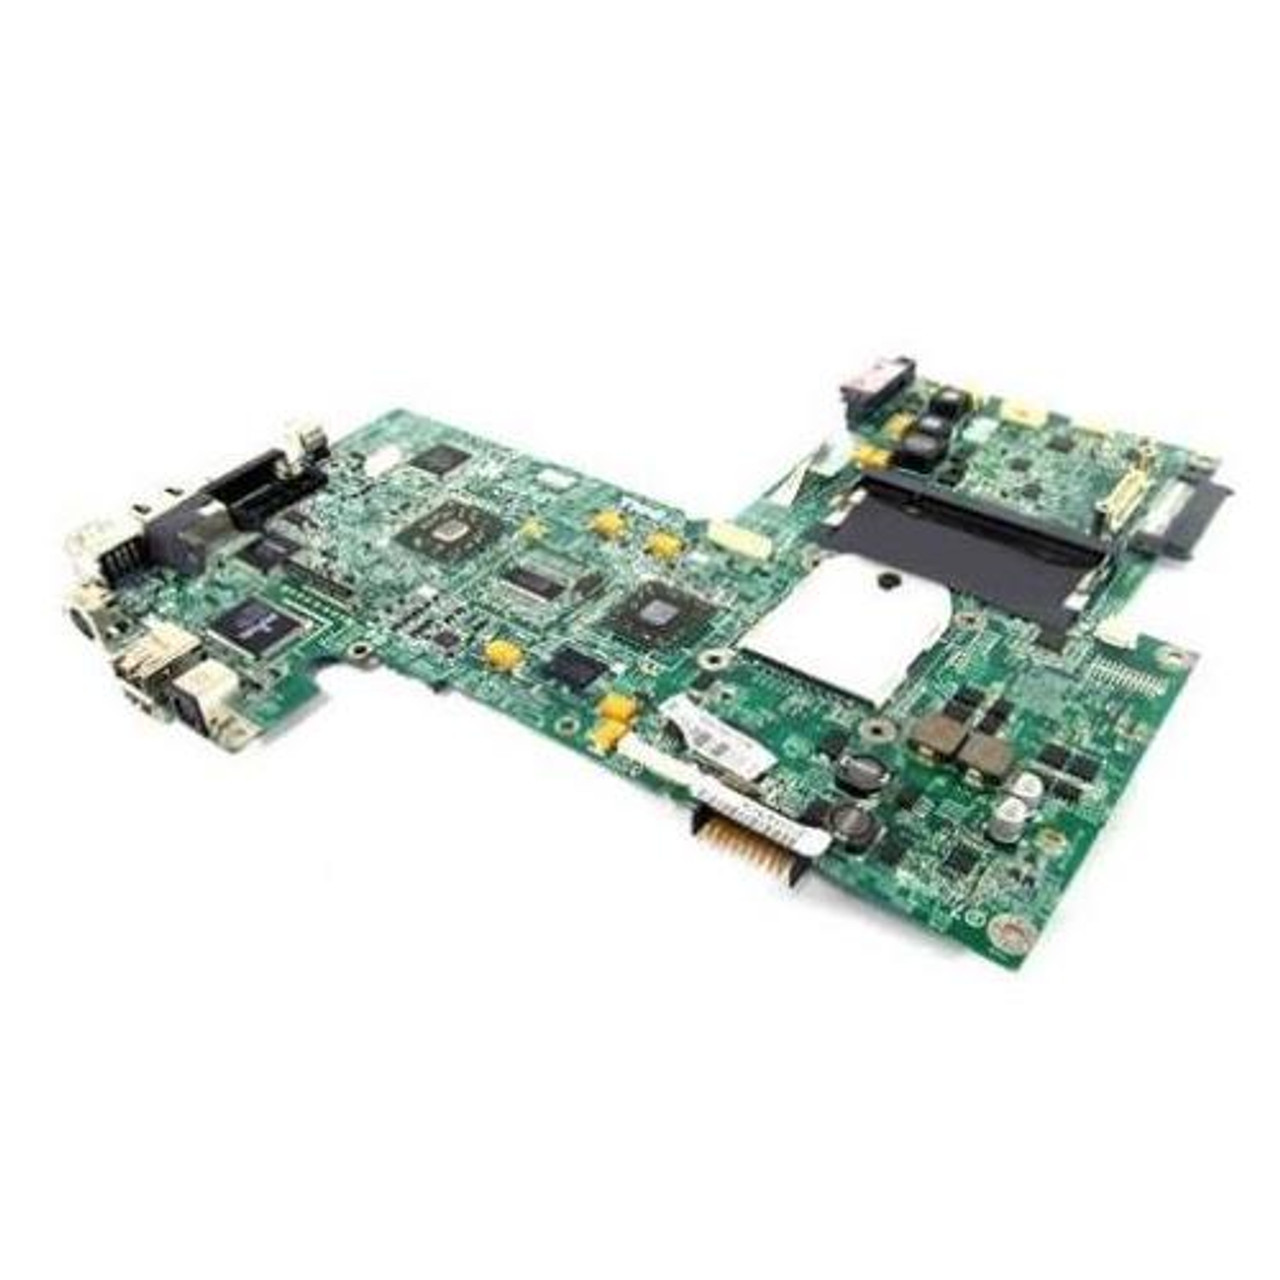 Dell 17 7737 Laptop Motherboard w// Intel i5-4200U 1.6Ghz CPU VHTPV